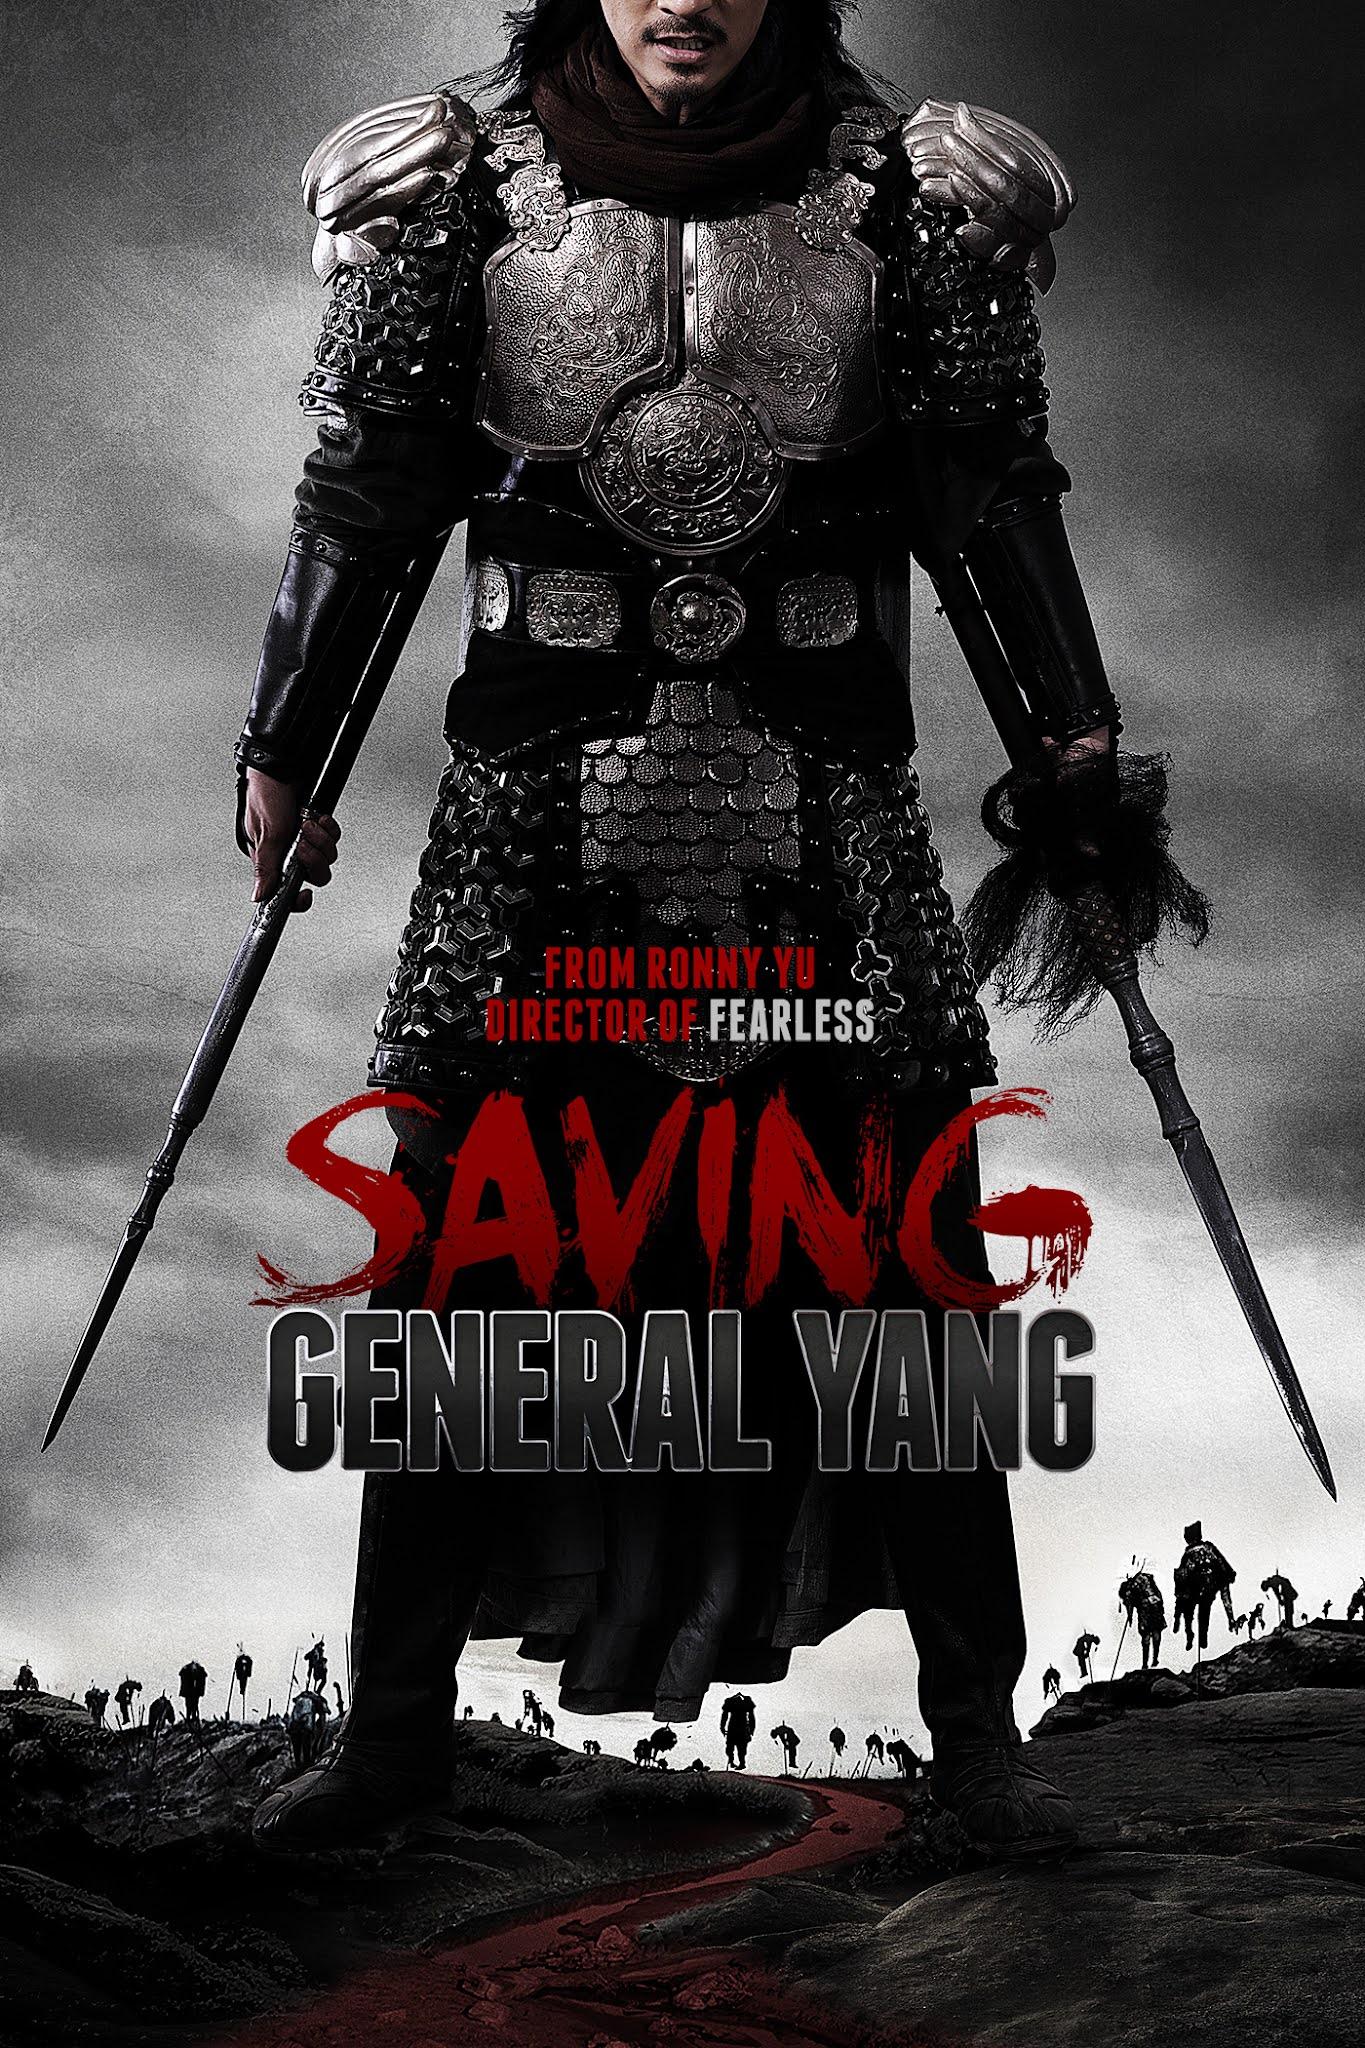 Saving General Yang 2013